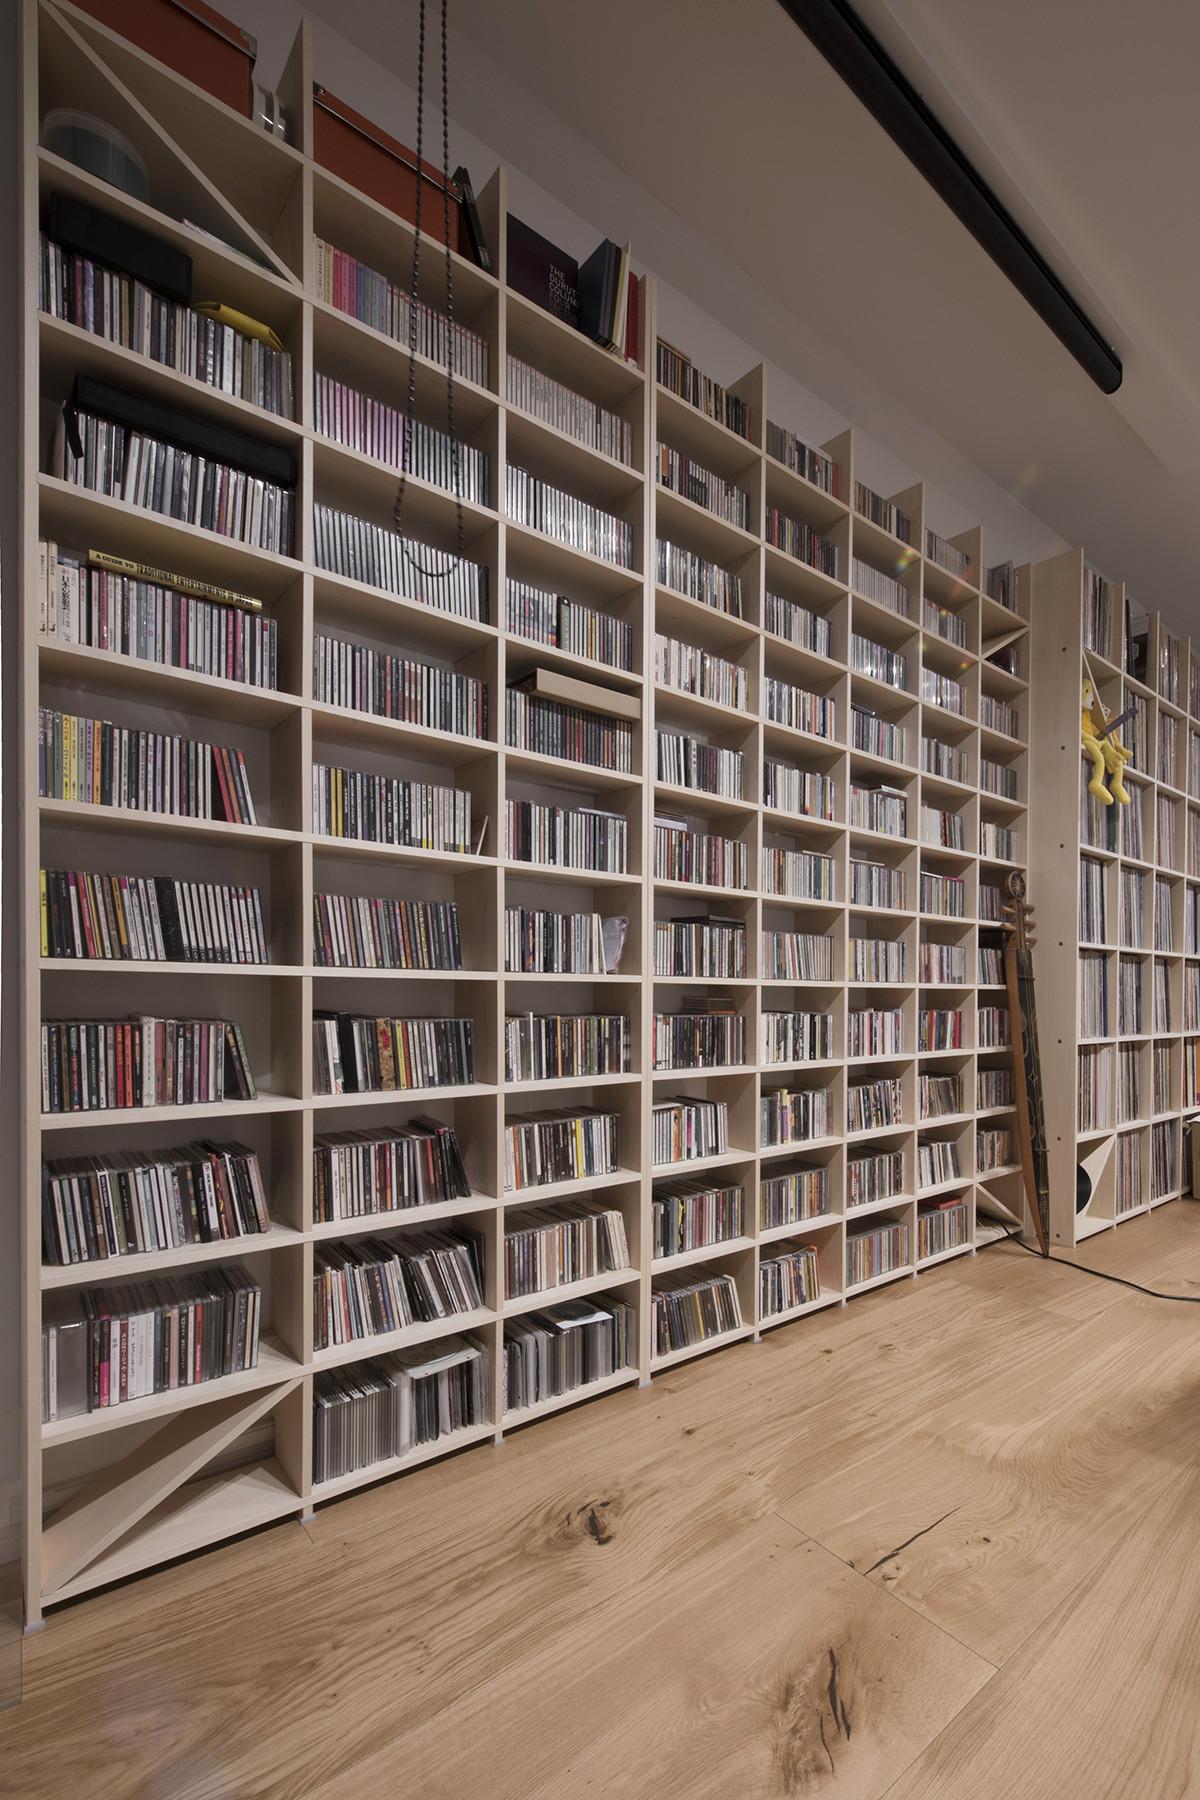 DJ・プロデューサー 井上薫さんの仕事場 その1   壁一面の本棚 奥行350mm/Shelf(No.58)